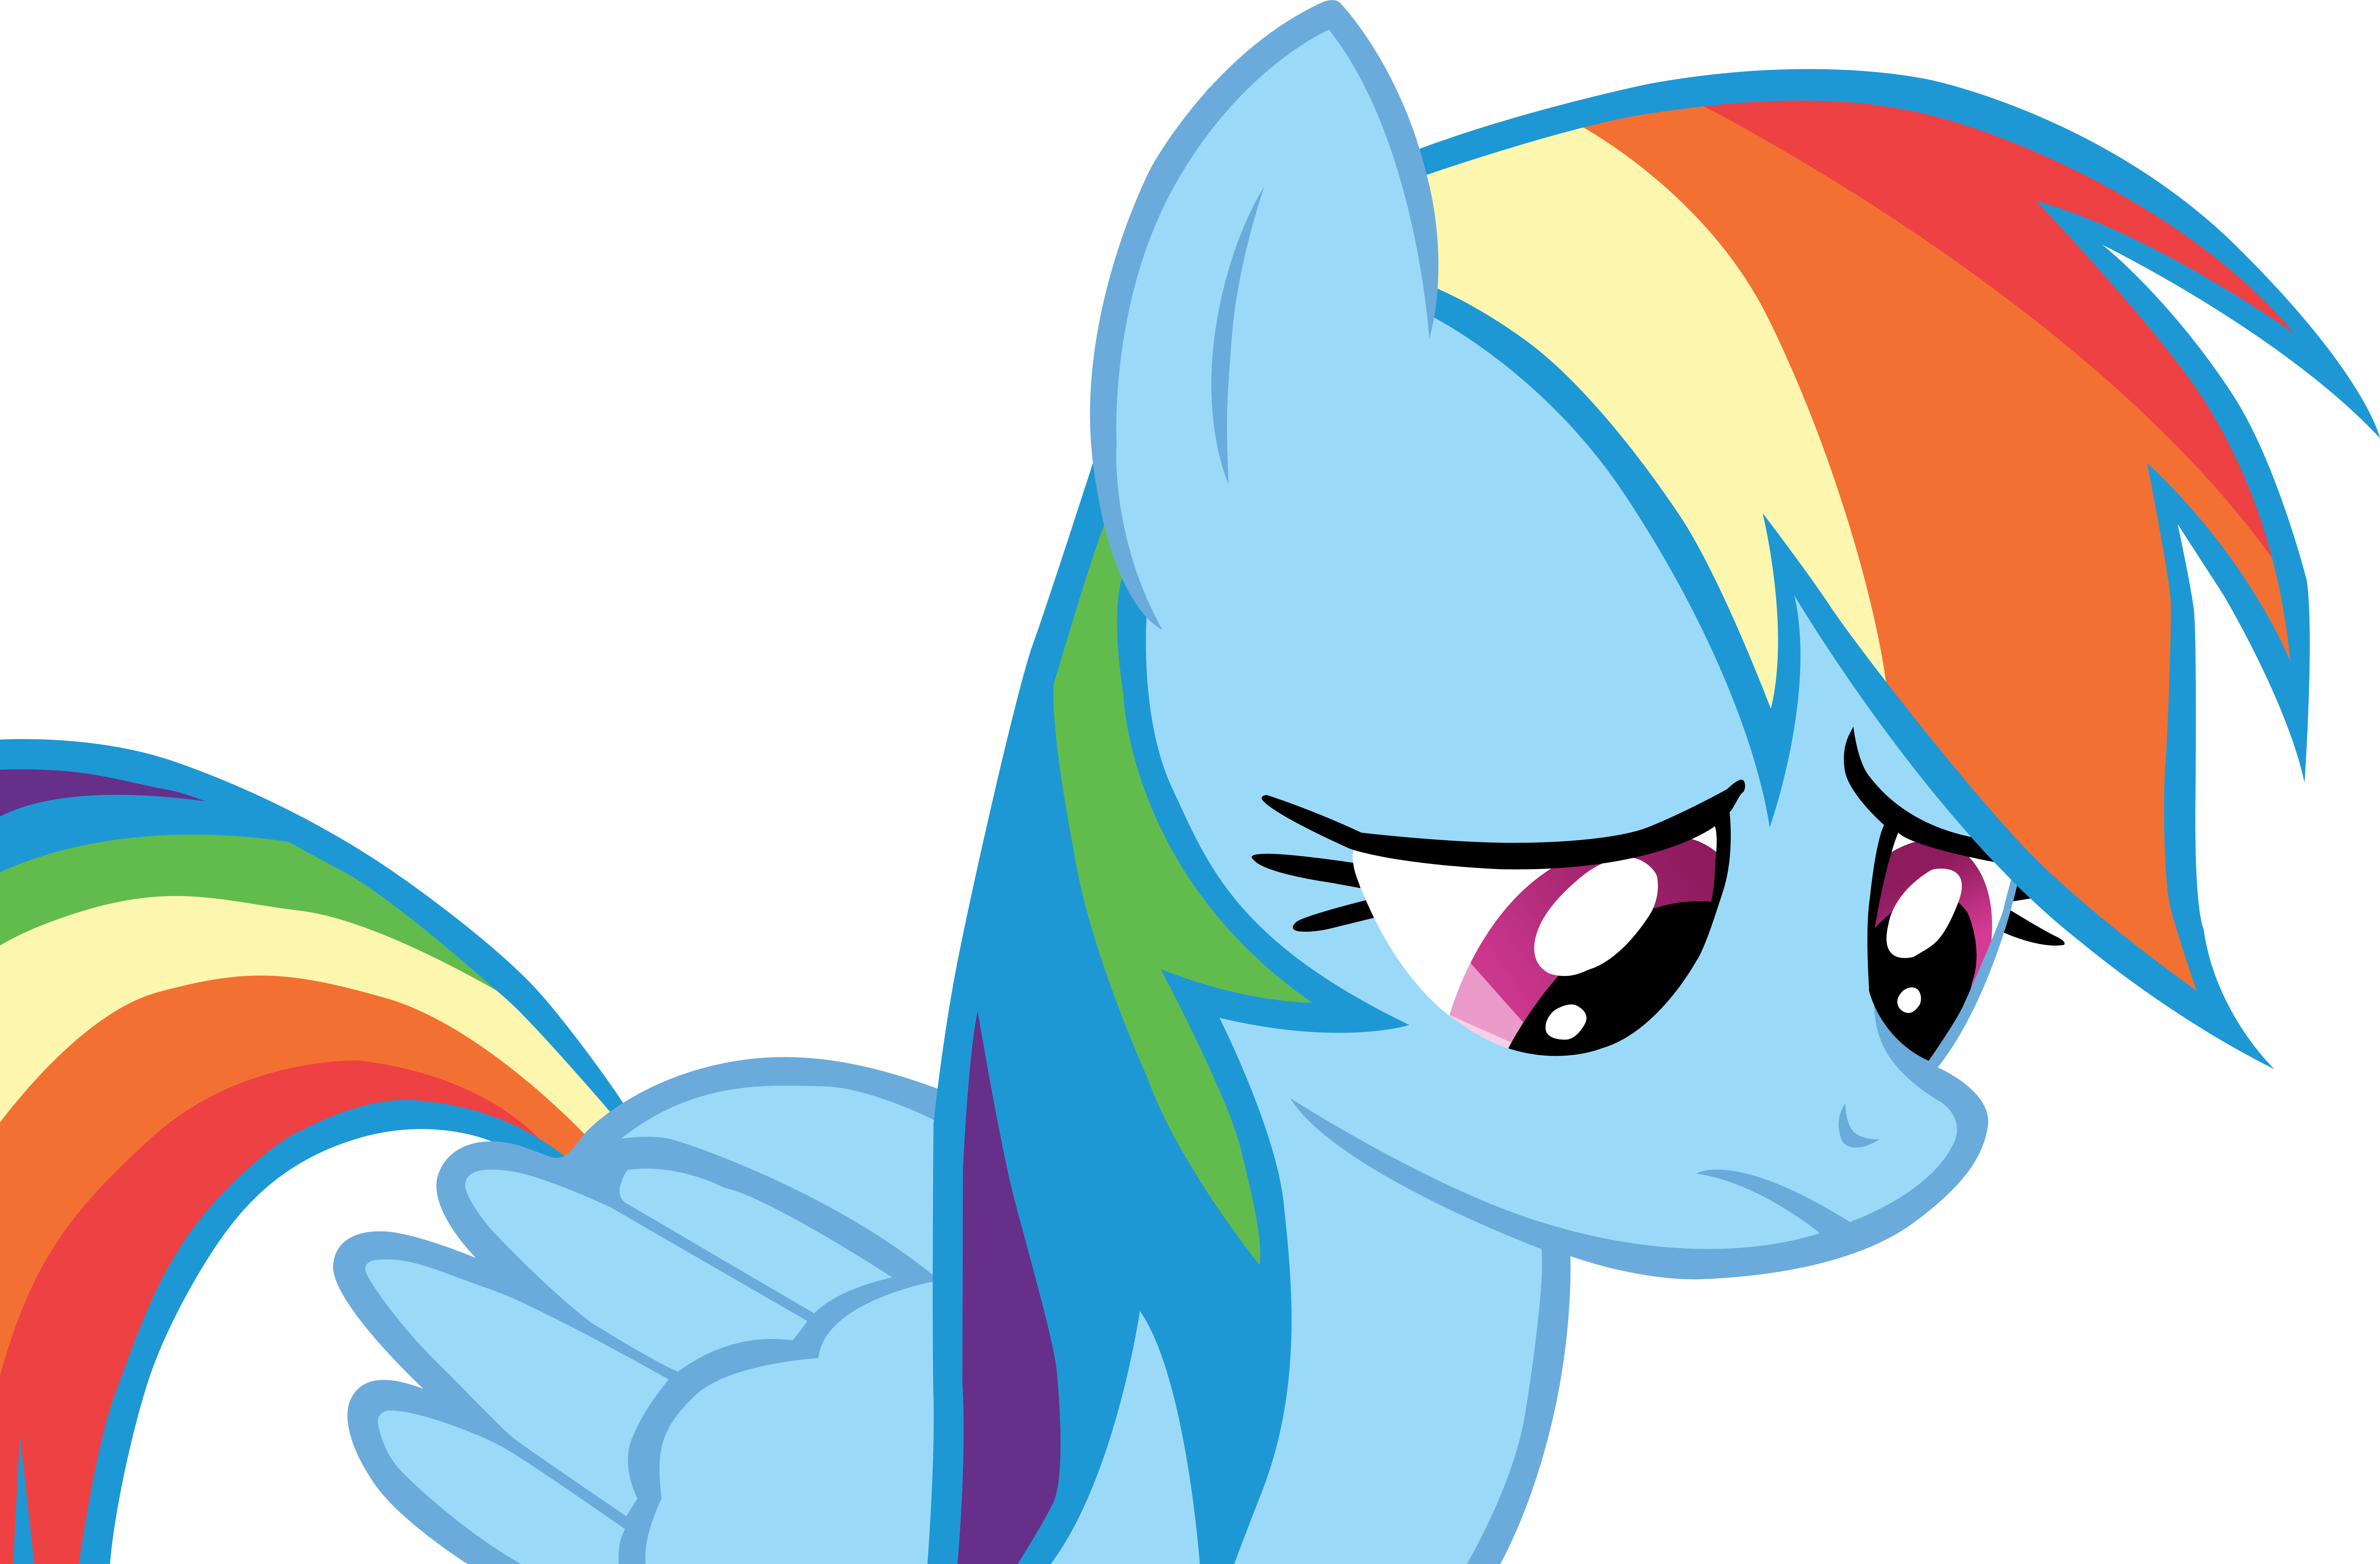 Sad Rainbow Dash is sad